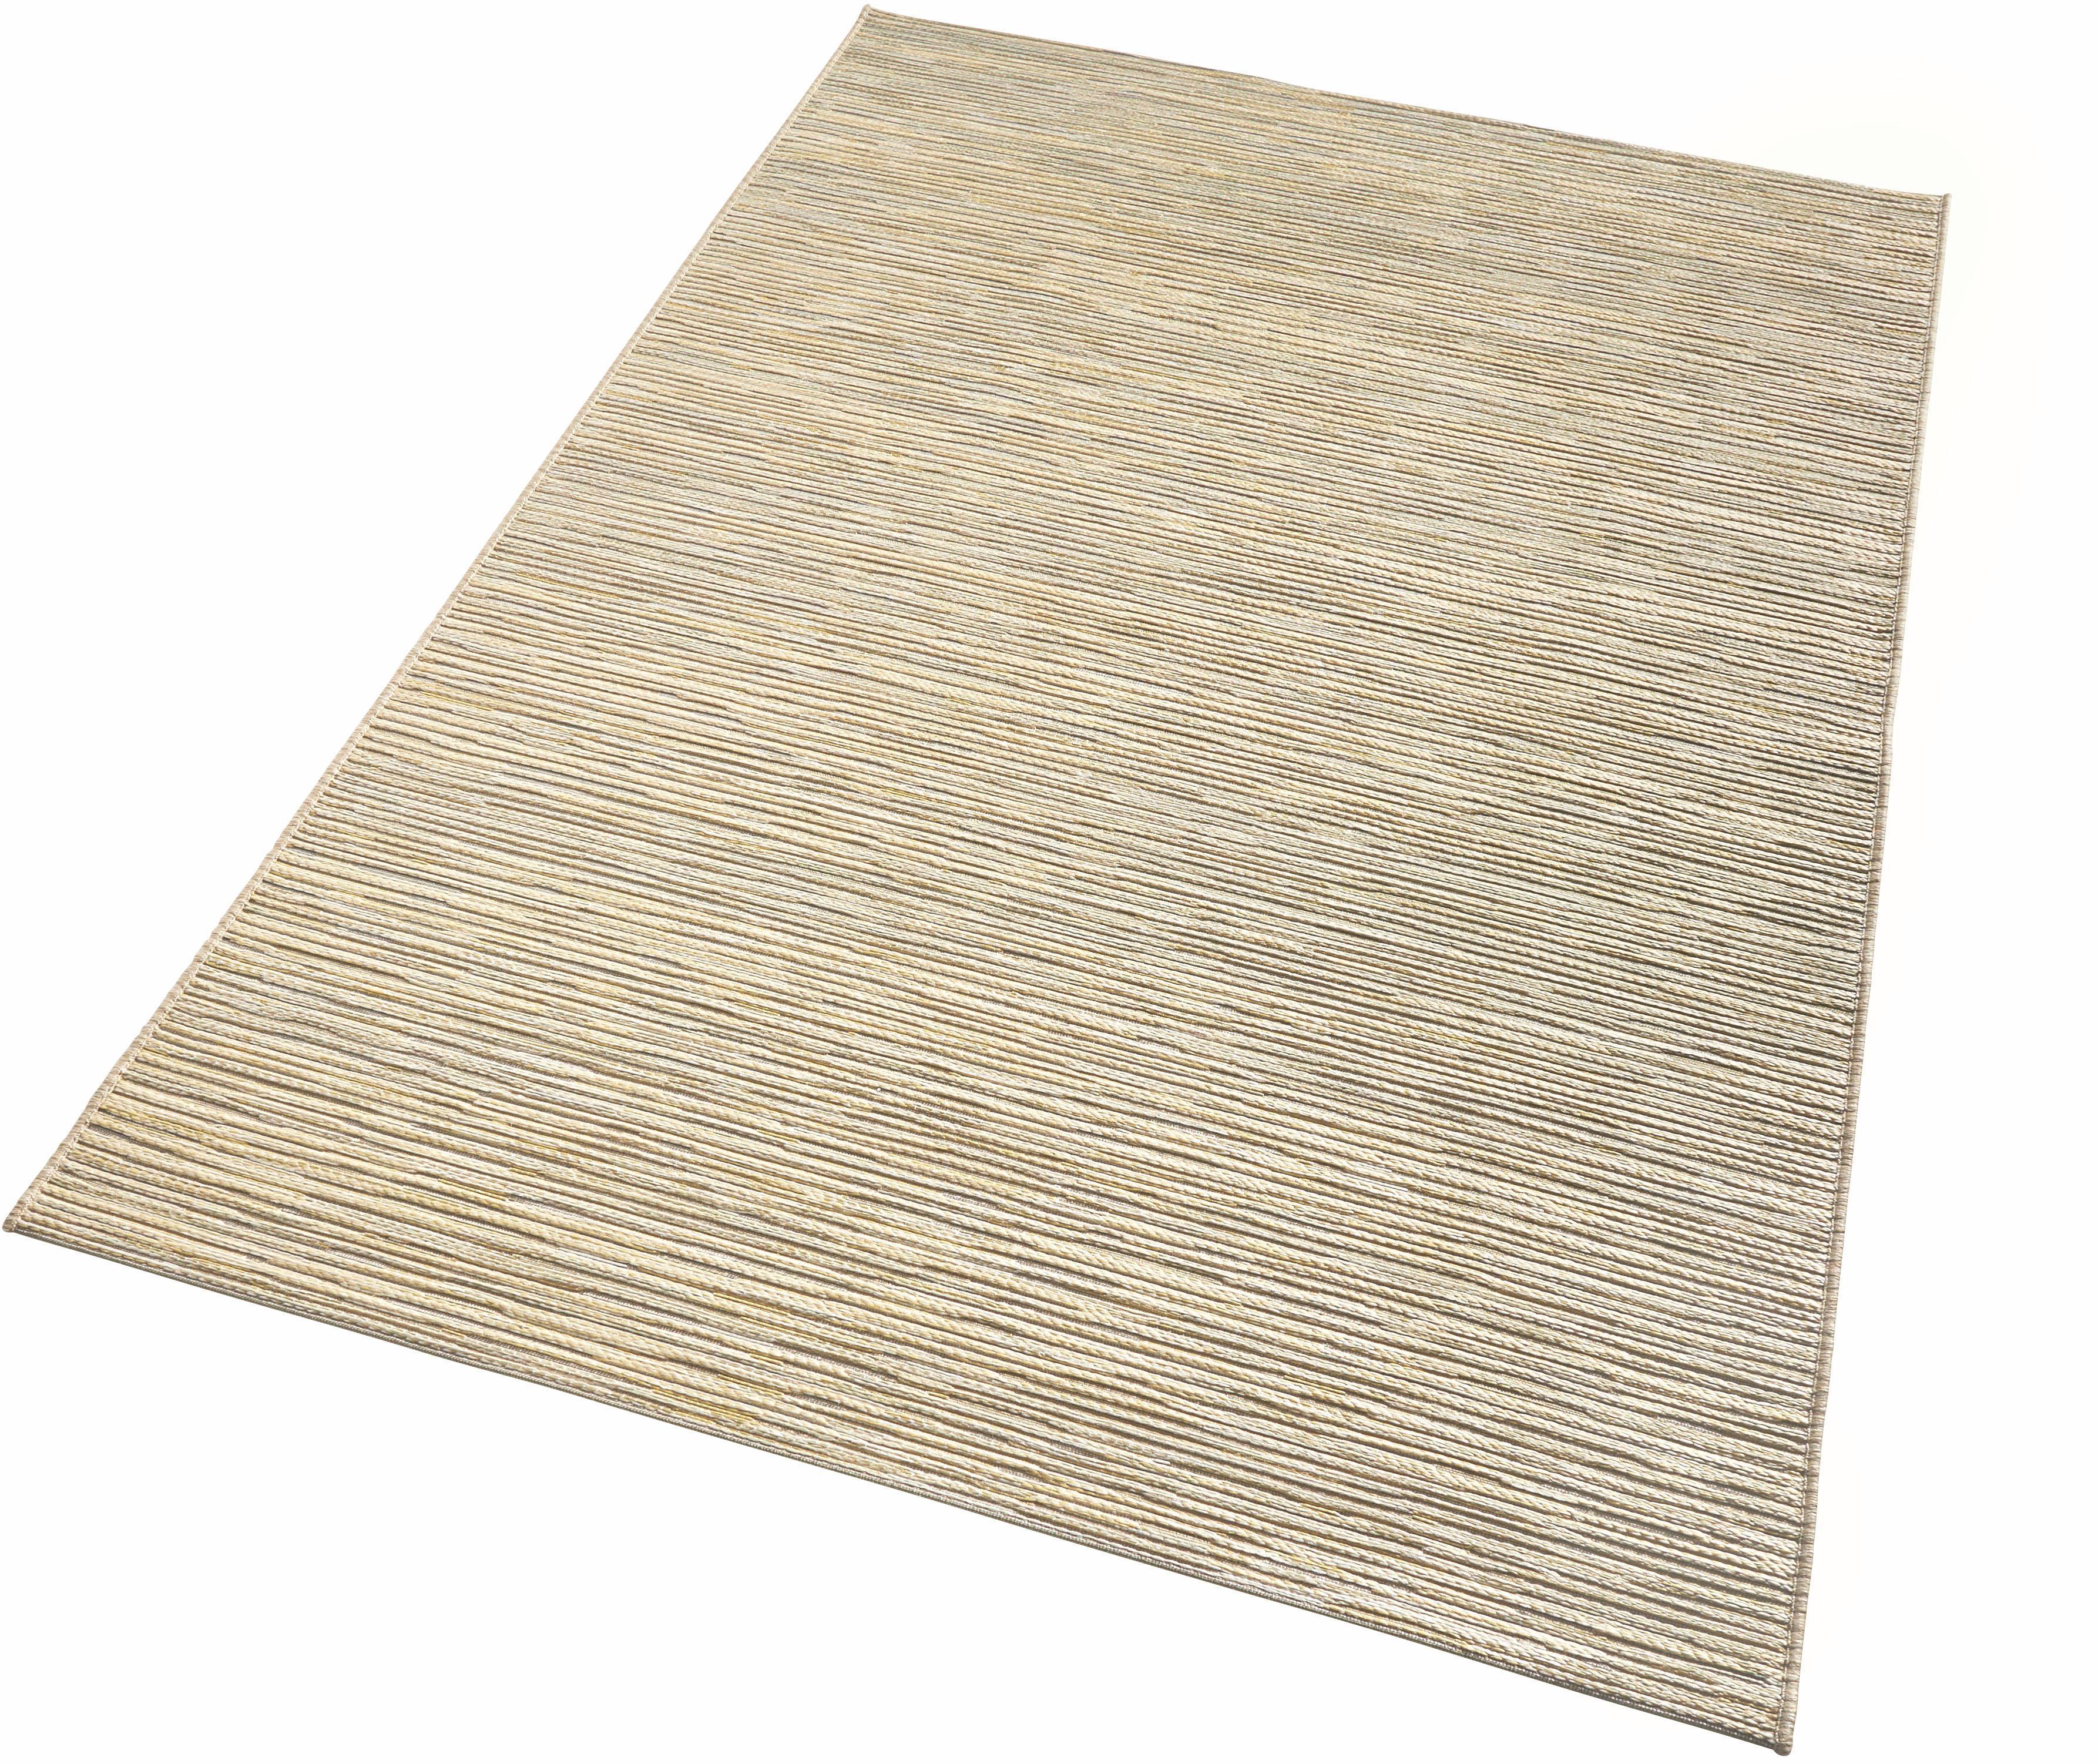 Teppich Ivy bougari rechteckig Höhe 7 mm maschinell gewebt